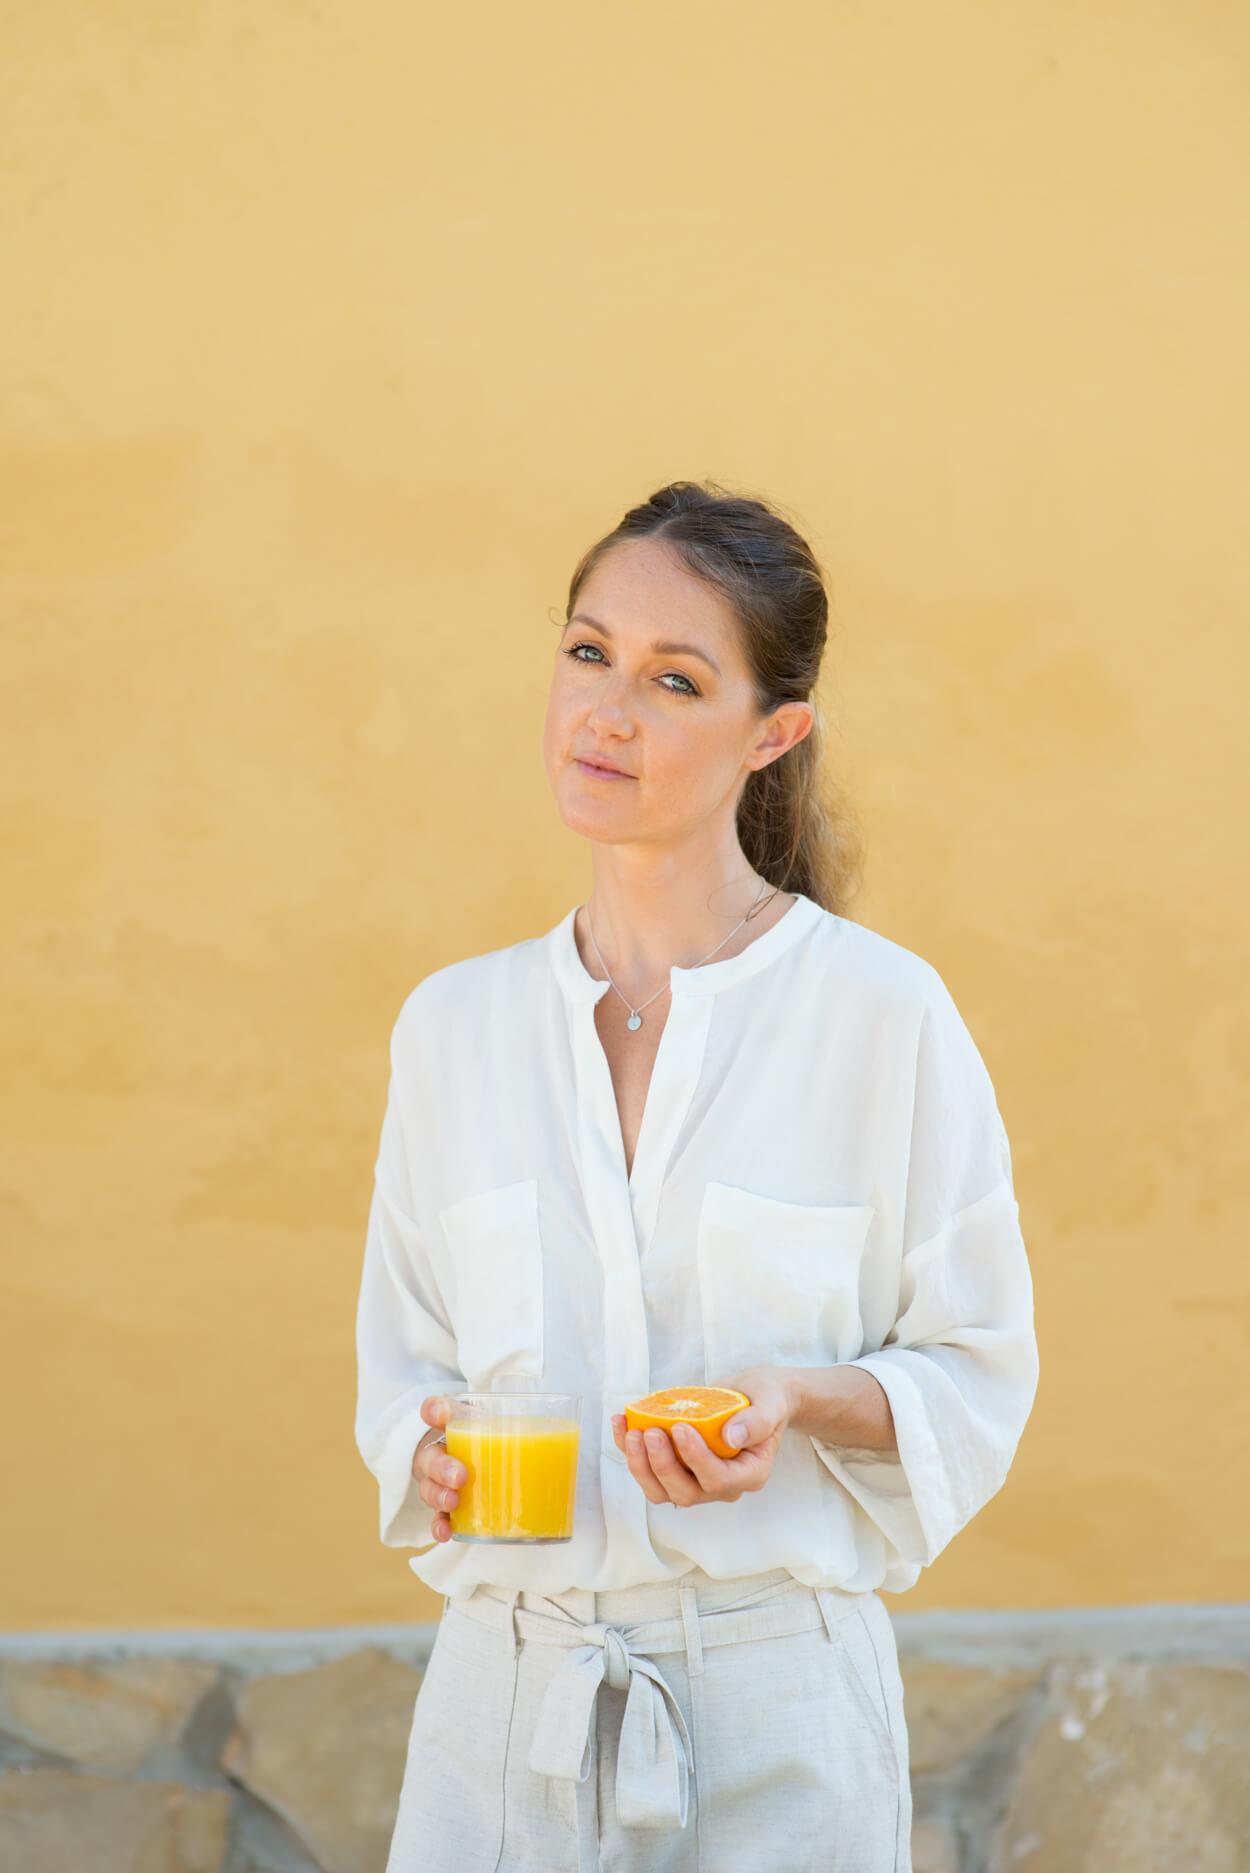 leanne portrait naturopath health coach with orange juice